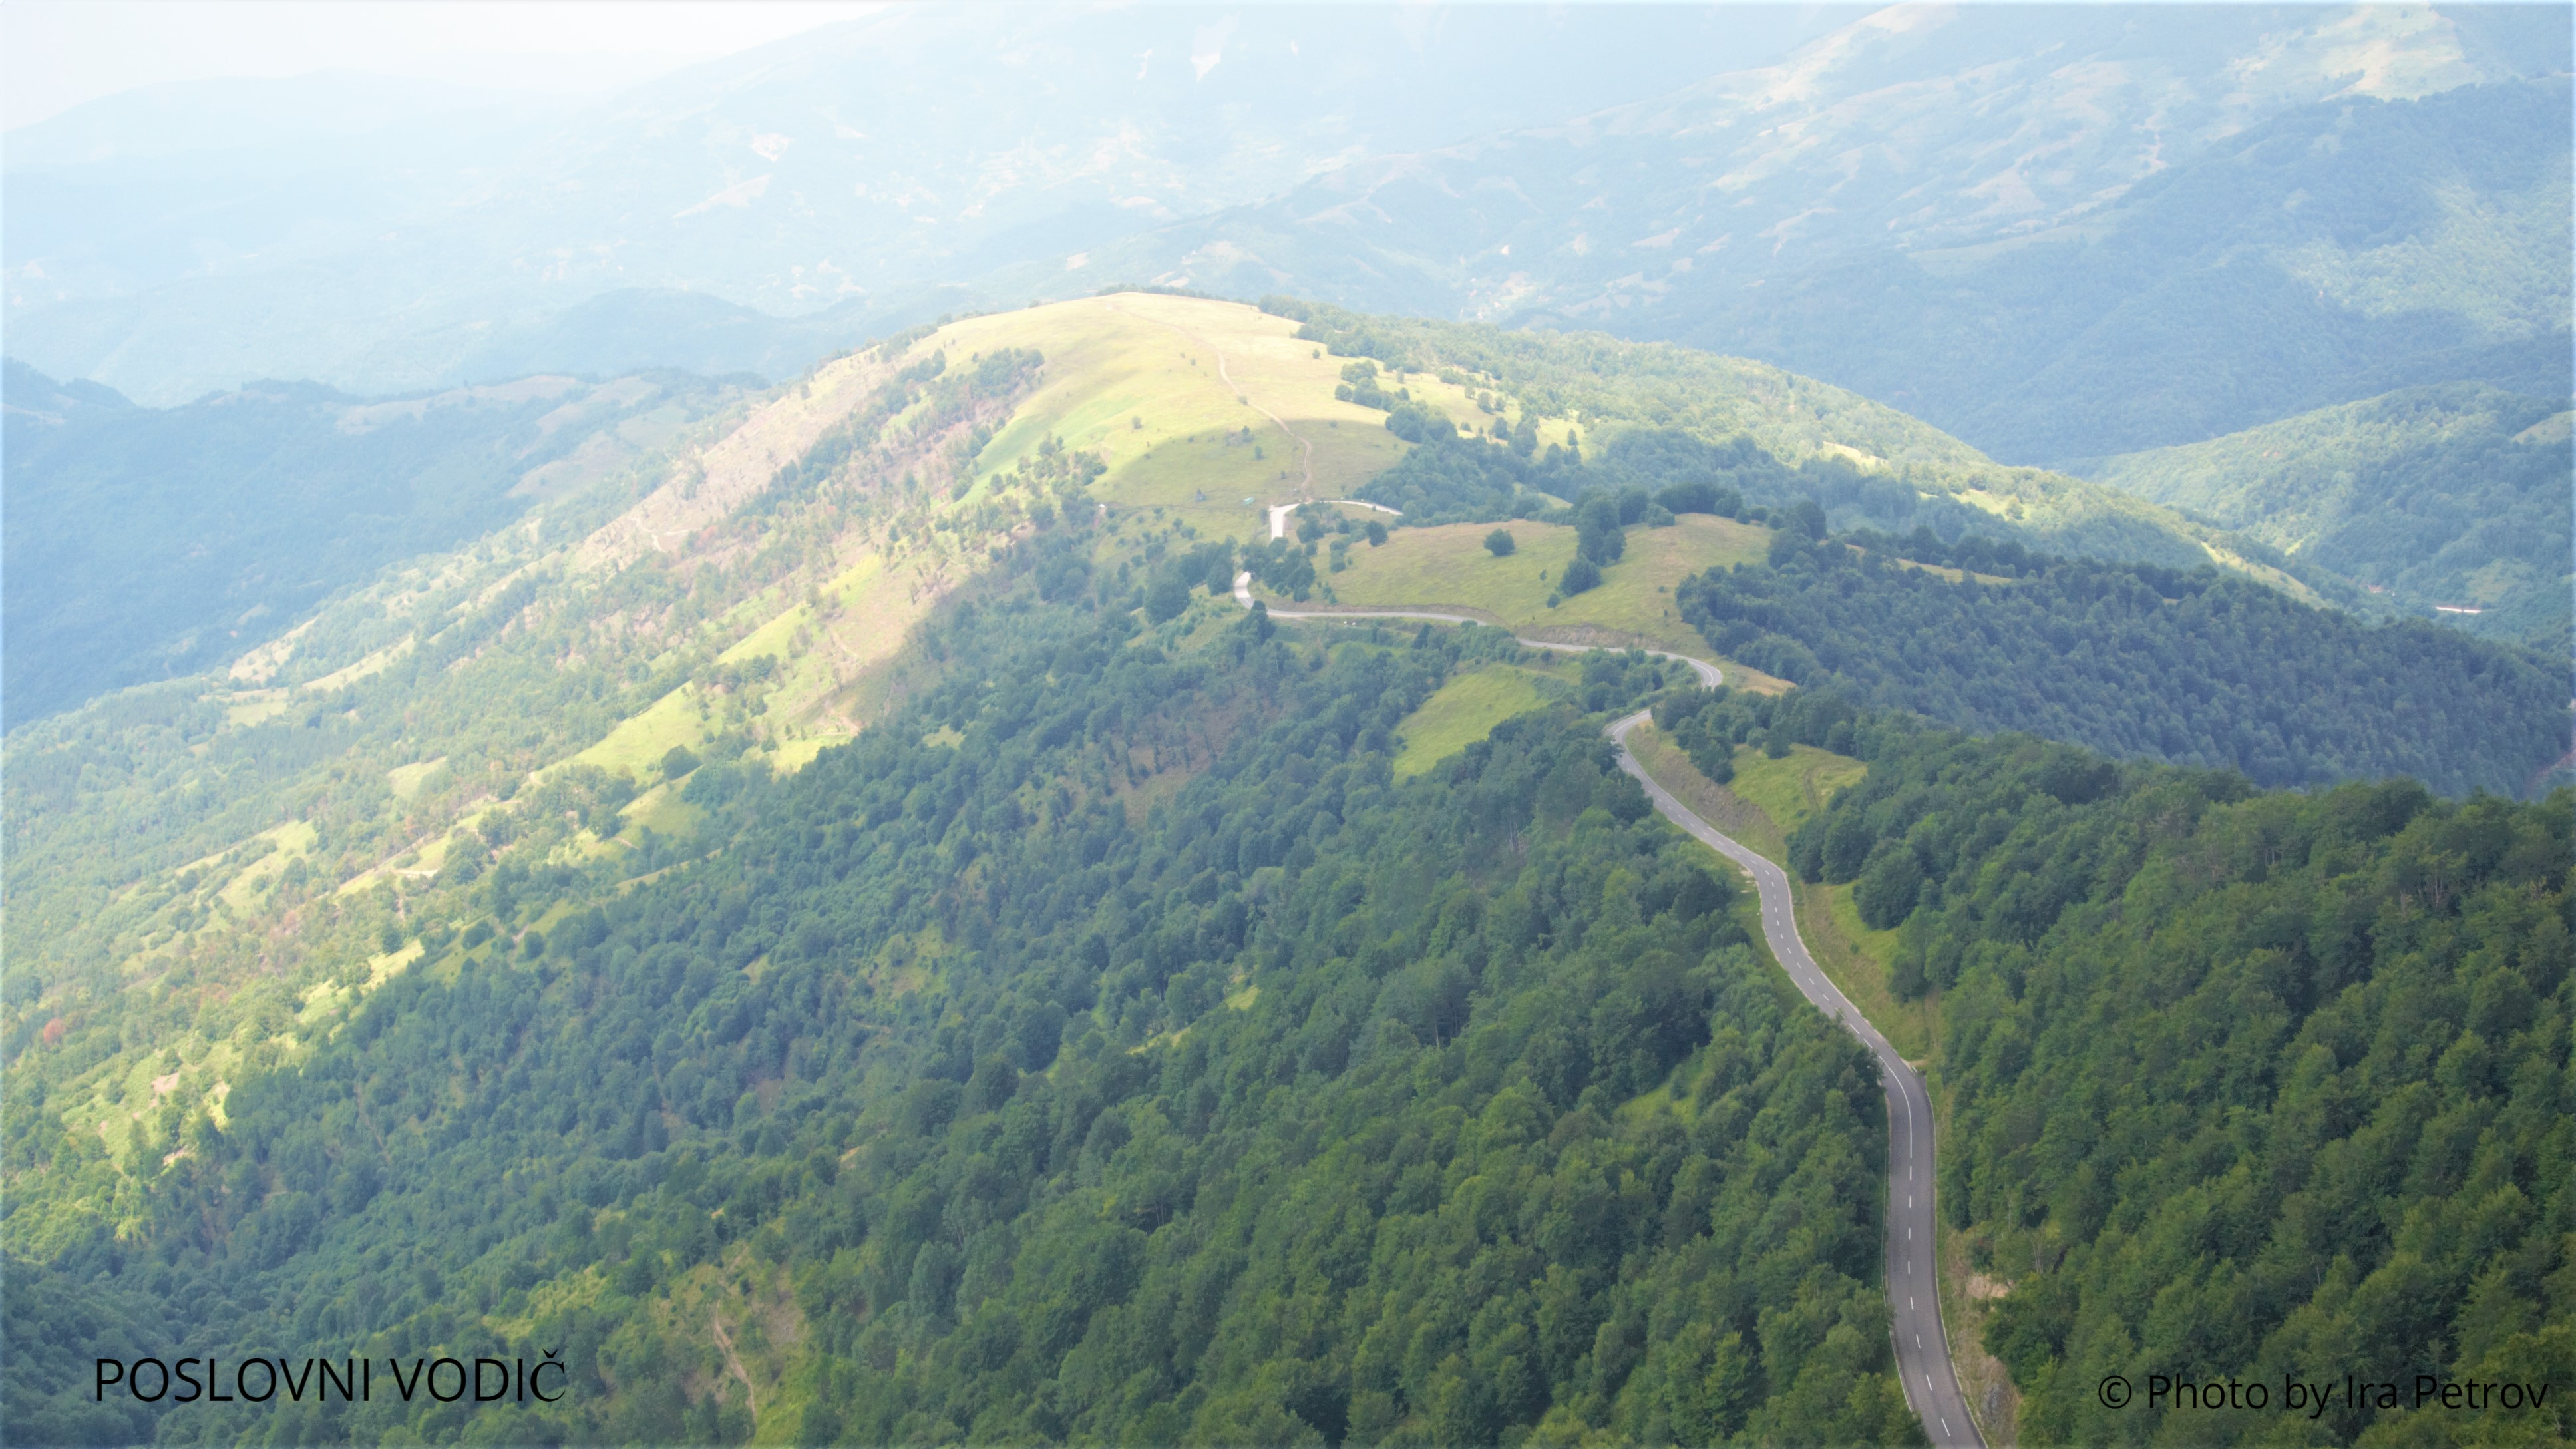 put_do_vrha_babin_zub_stara_planina_pogled_sa_vidikovca_avgust_2019_photo_by_ira_petrov